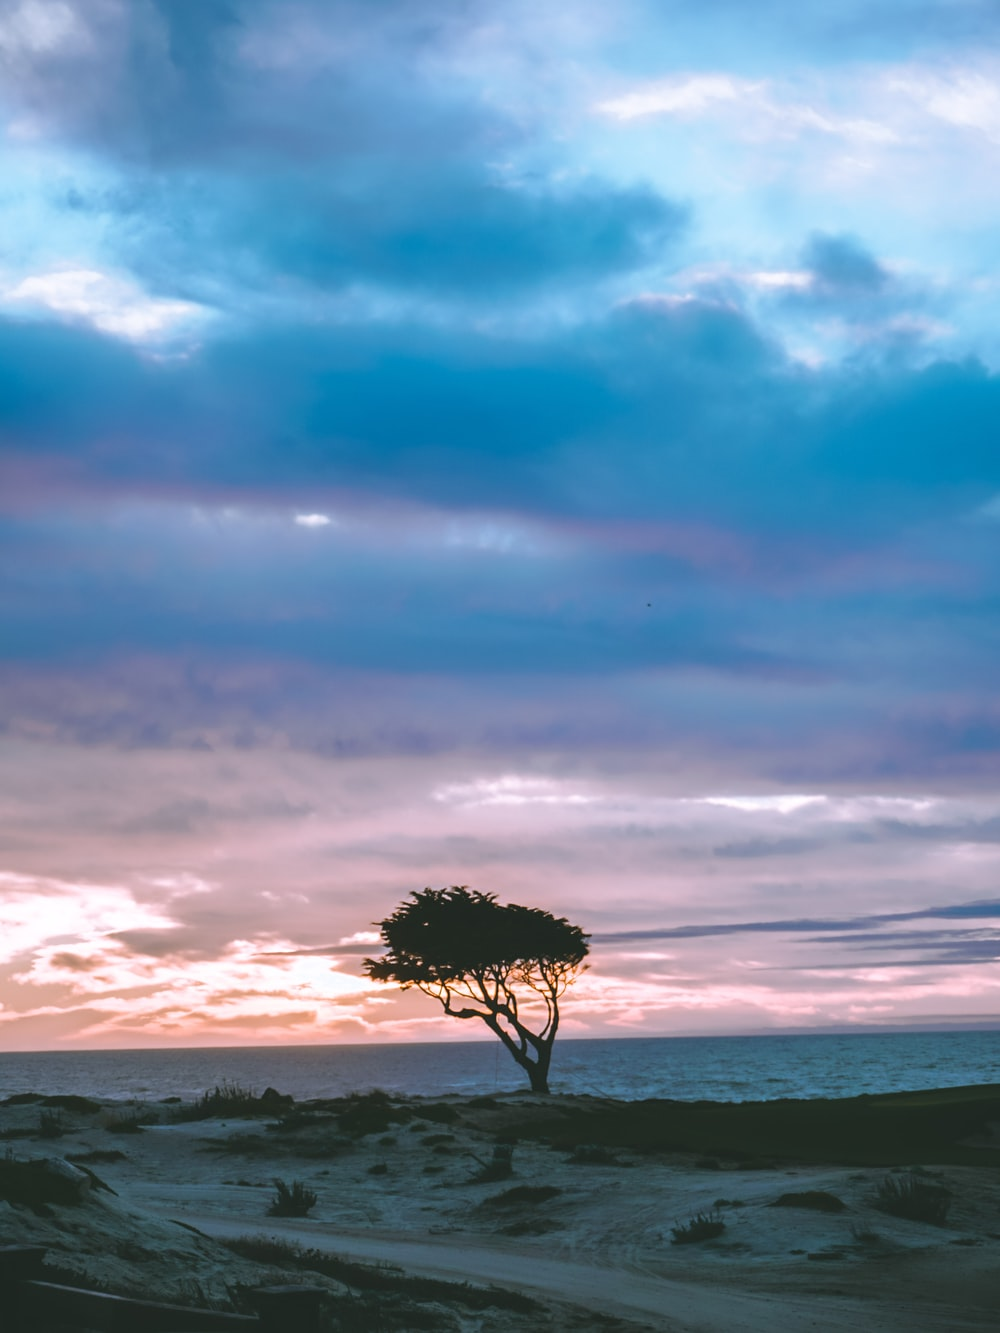 tree at shore under blue sky